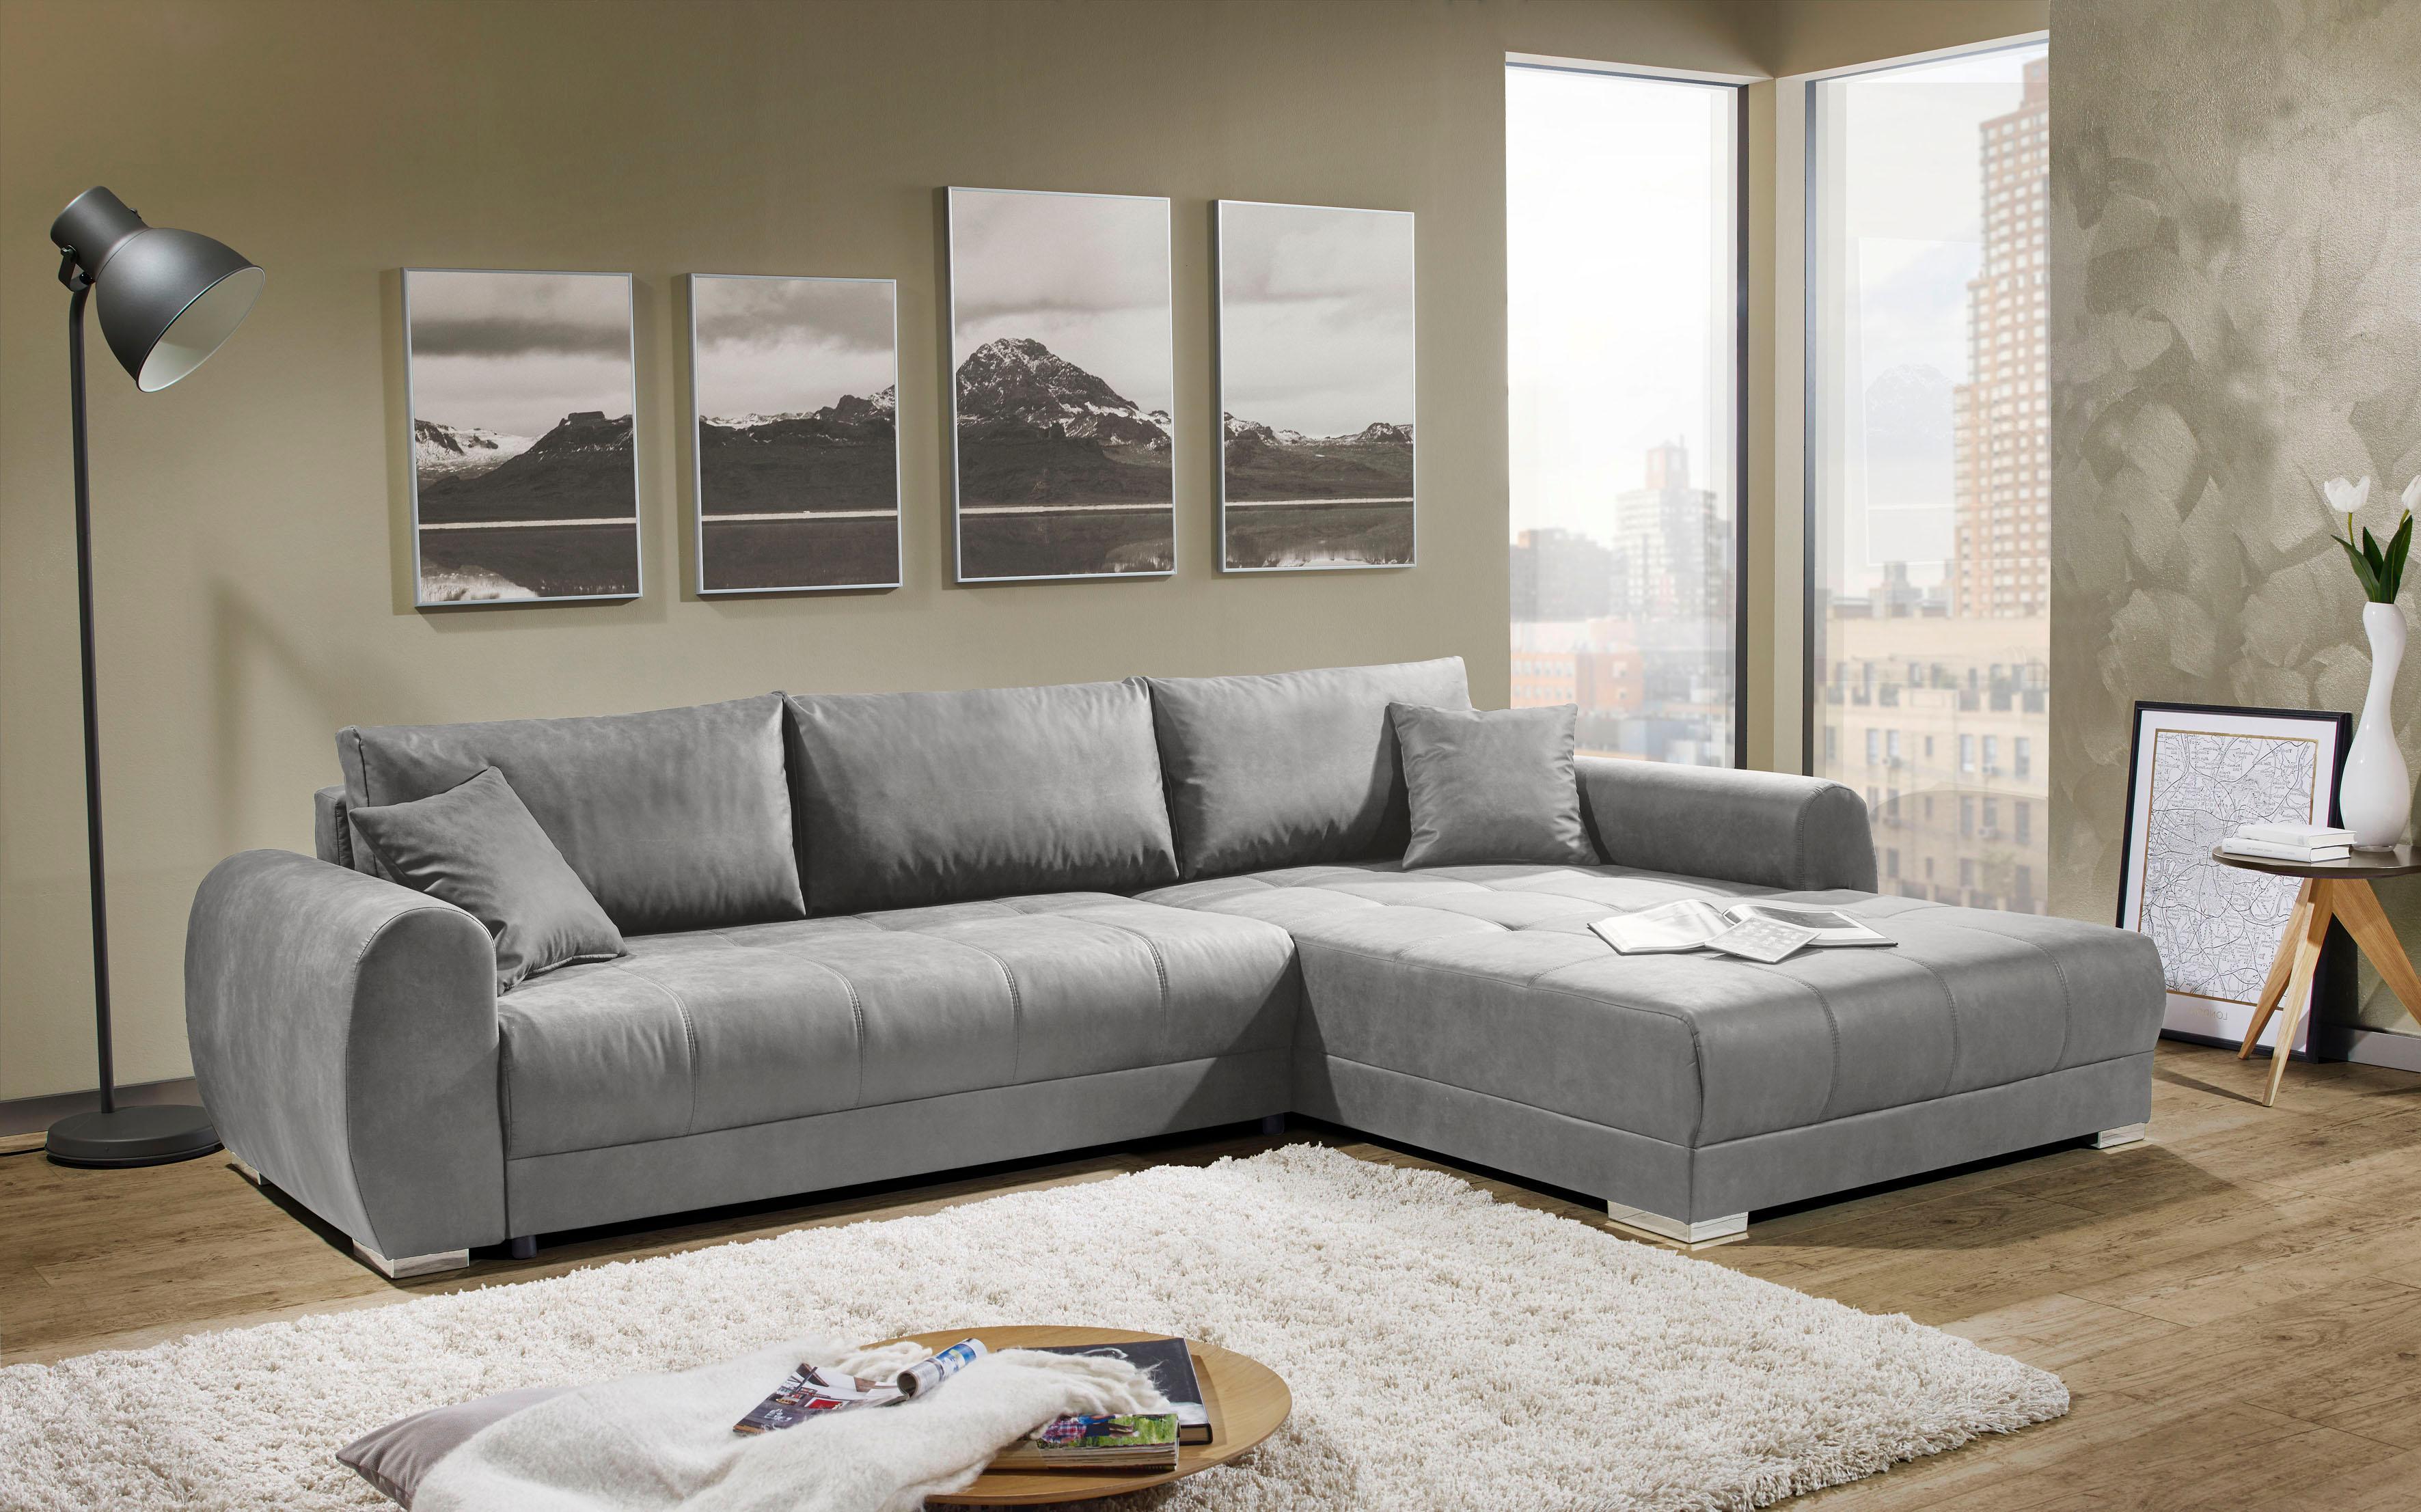 Places of Style Ecksofa Renton143 mit Bettfunktion